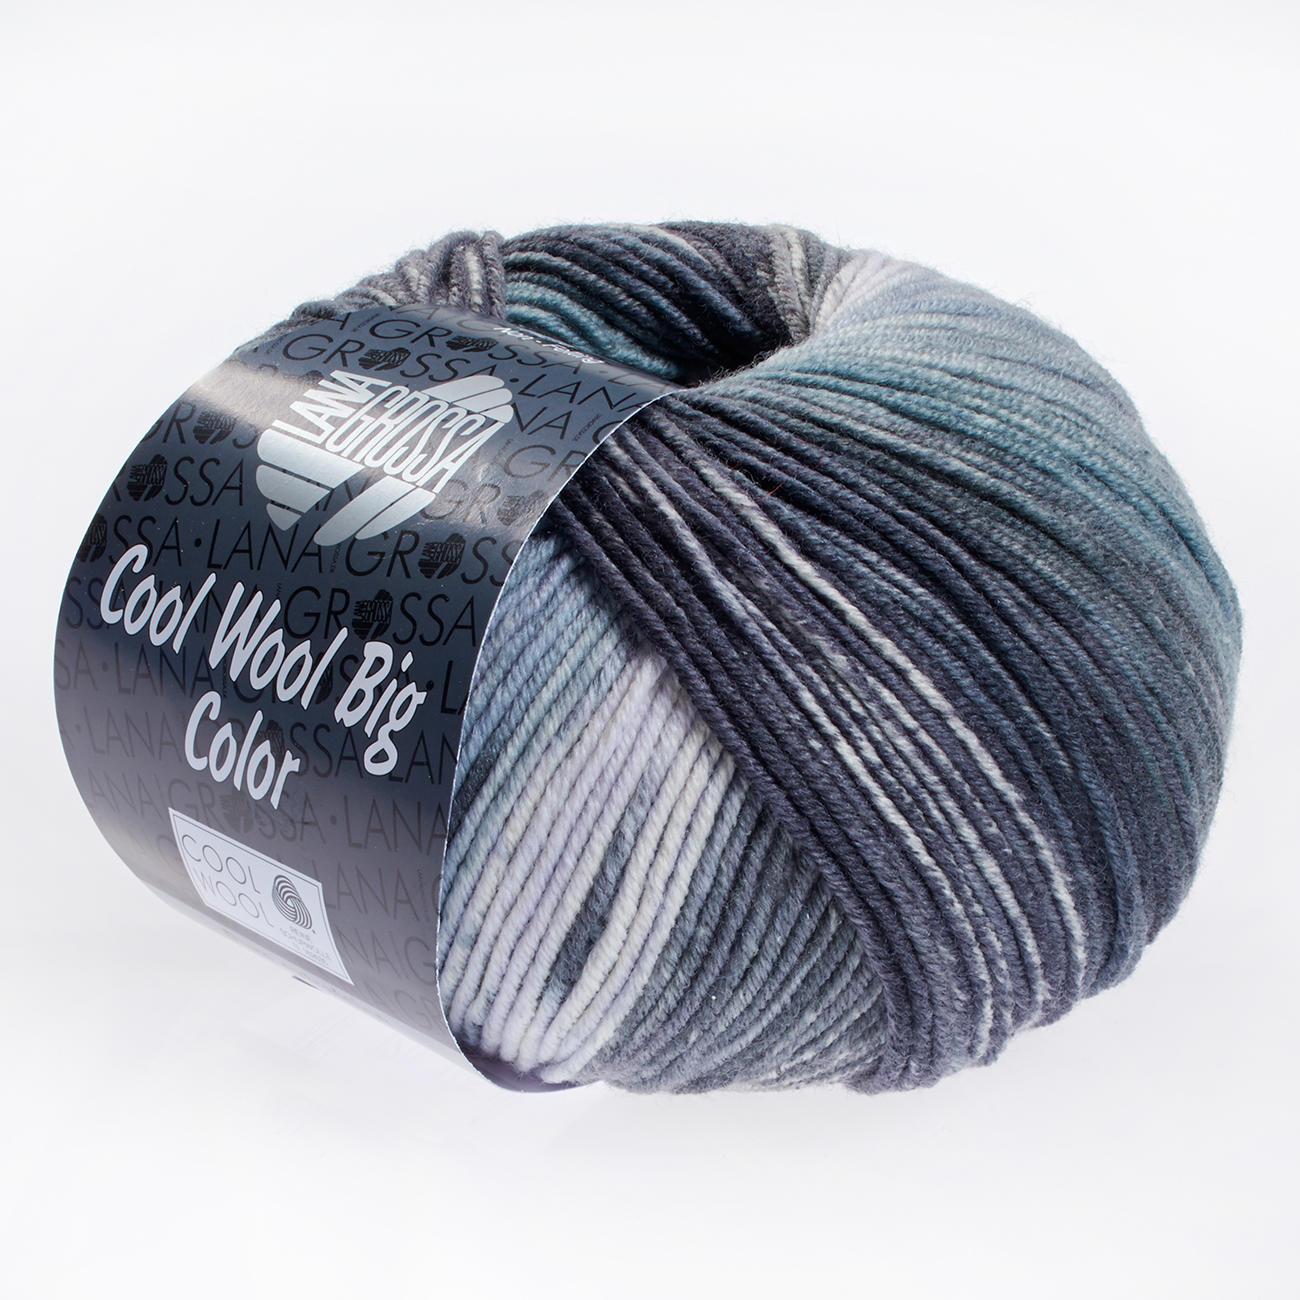 cool wool big color von lana grossa 8 versch farben. Black Bedroom Furniture Sets. Home Design Ideas